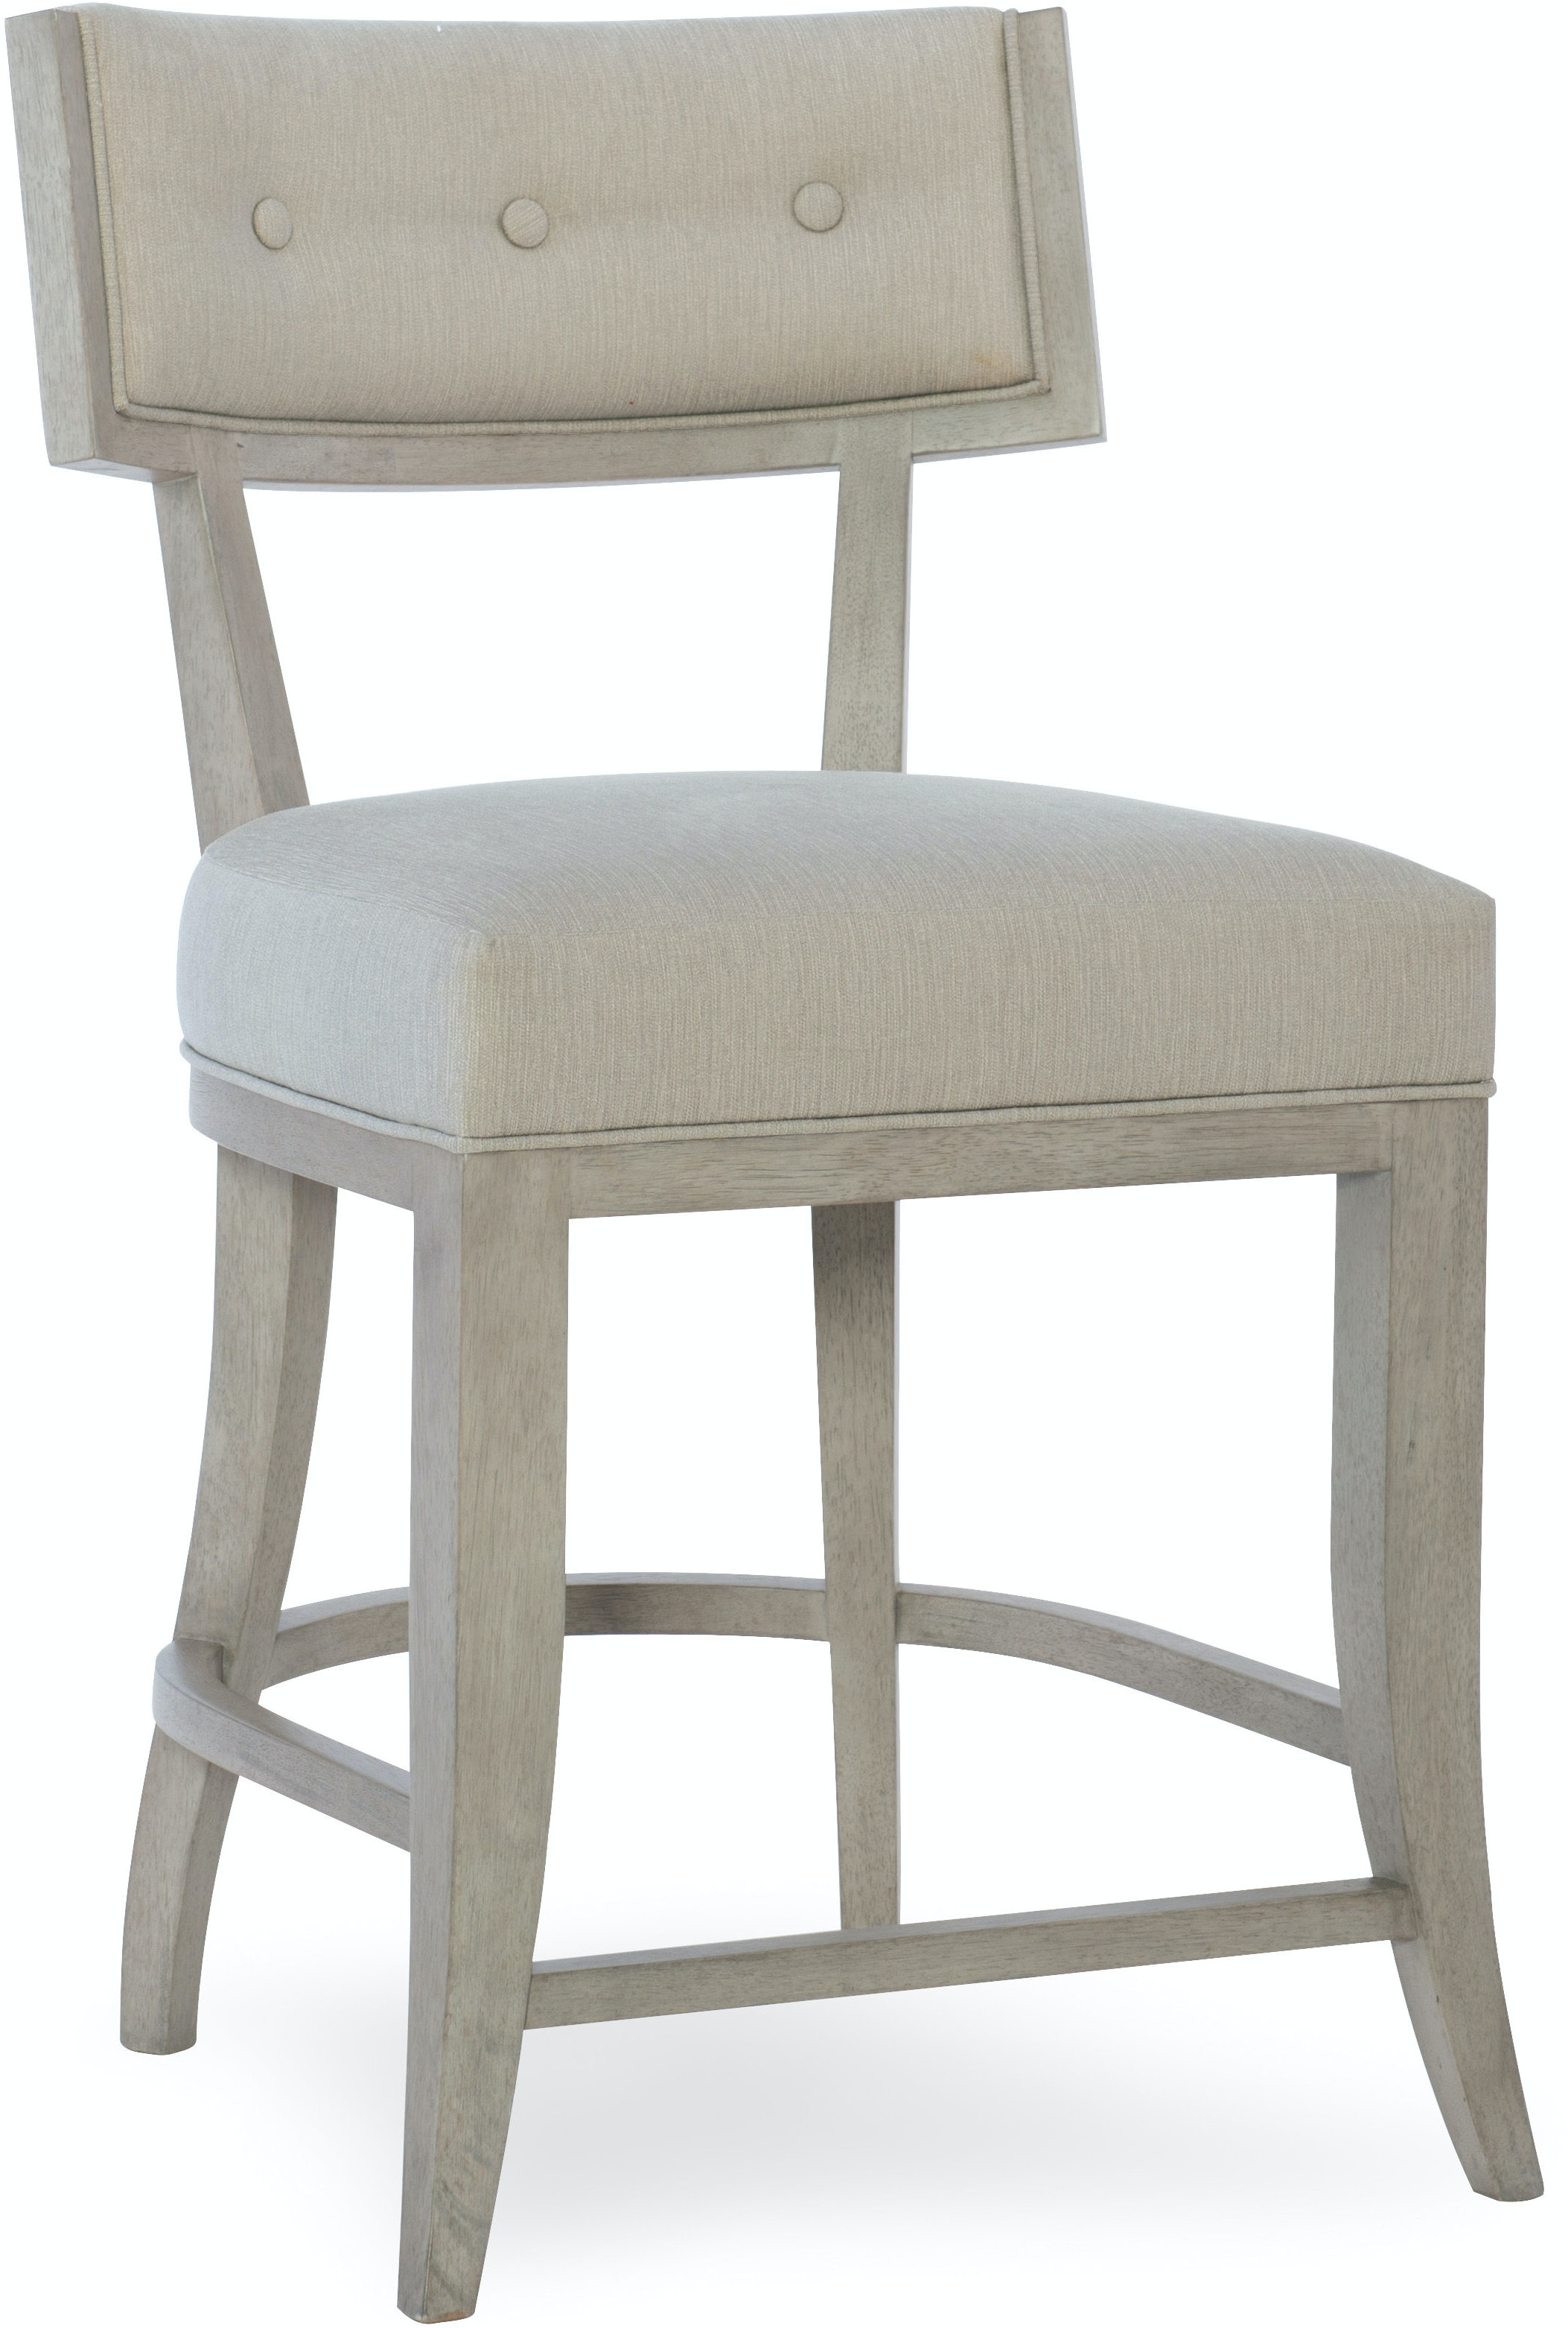 Hooker Furniture Dining Room Elixir Klismos Counter Stool  : 5990 25350 ltwd front from www.megbrown.com size 1024 x 768 jpeg 23kB